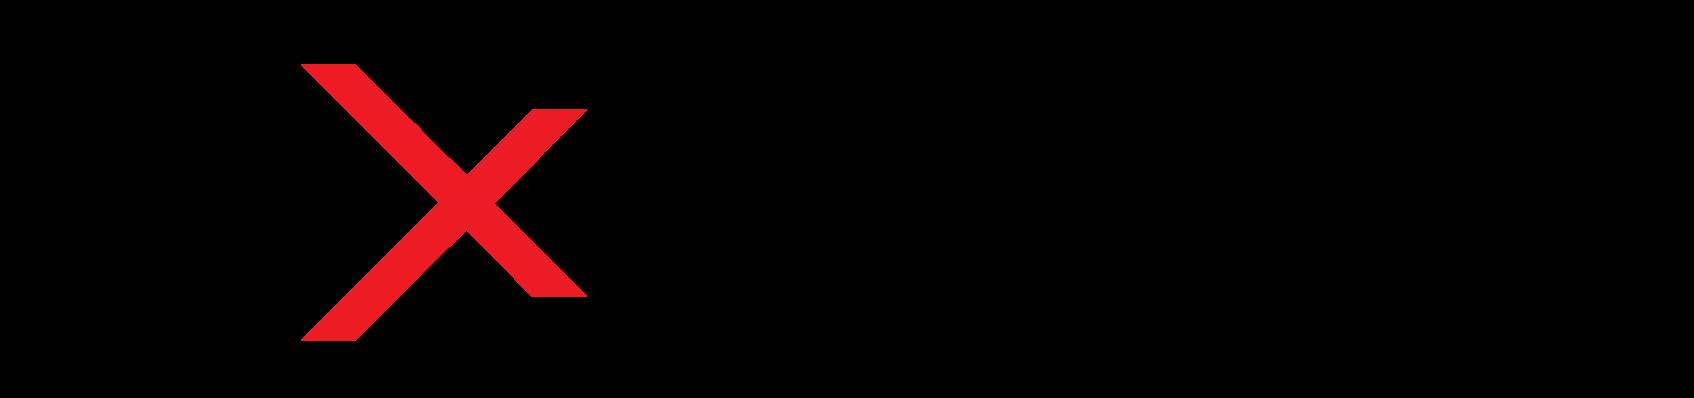 express logos